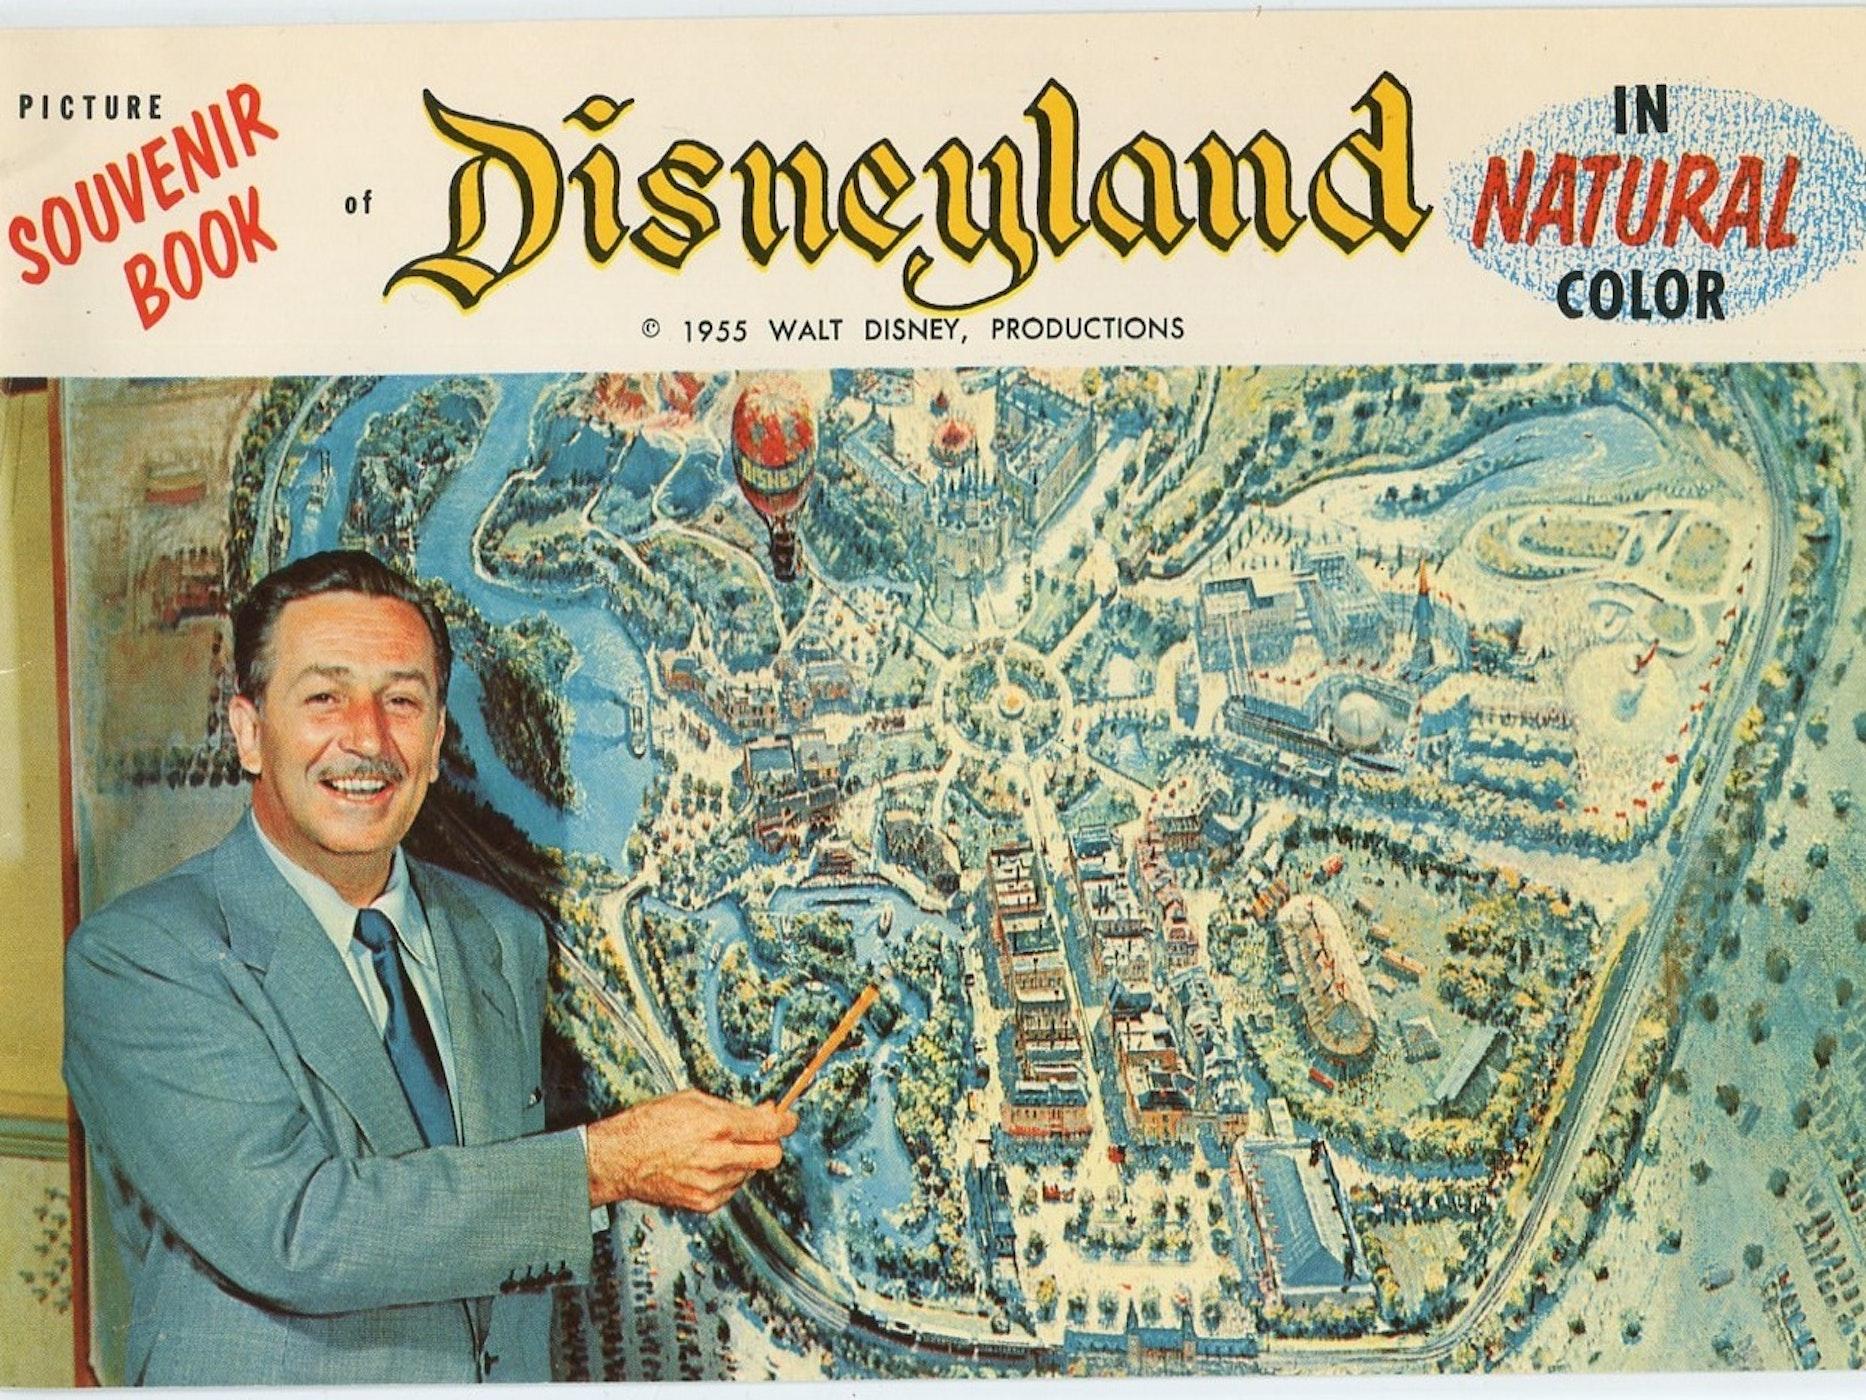 Walt Disney with a map of the original Disneyland